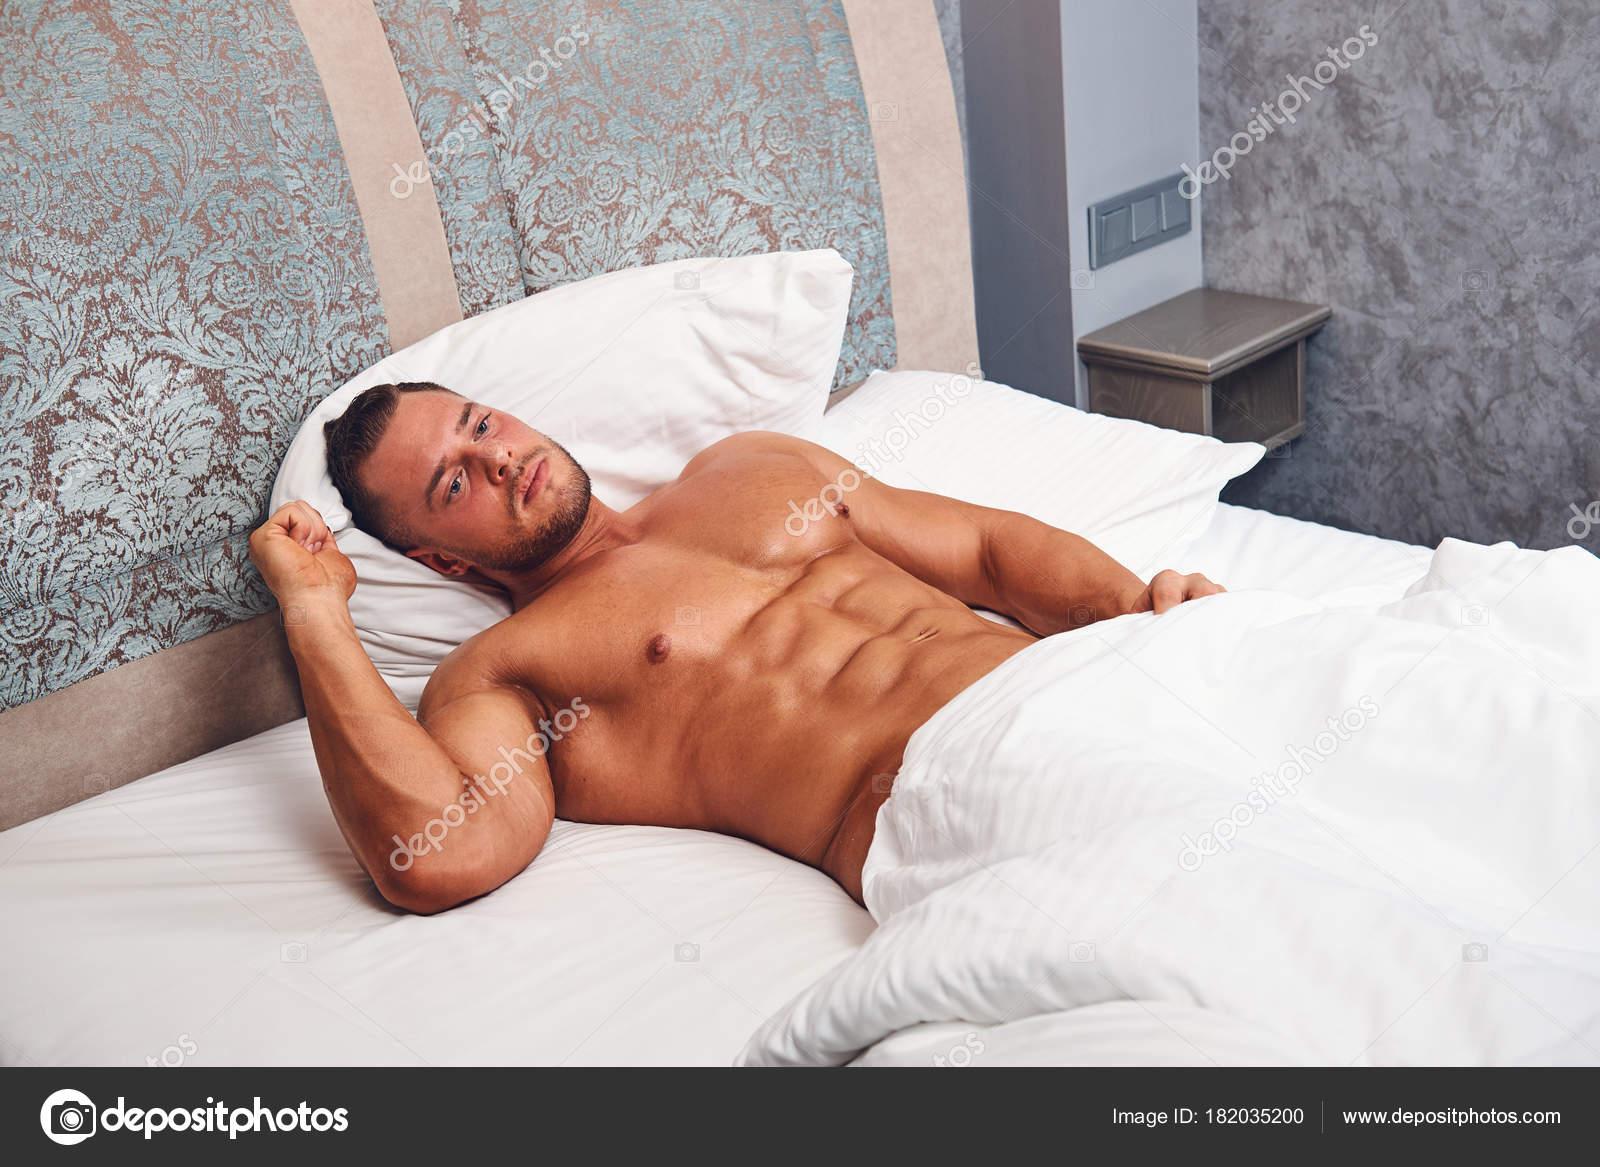 Обнаженный мужчина лежа фото